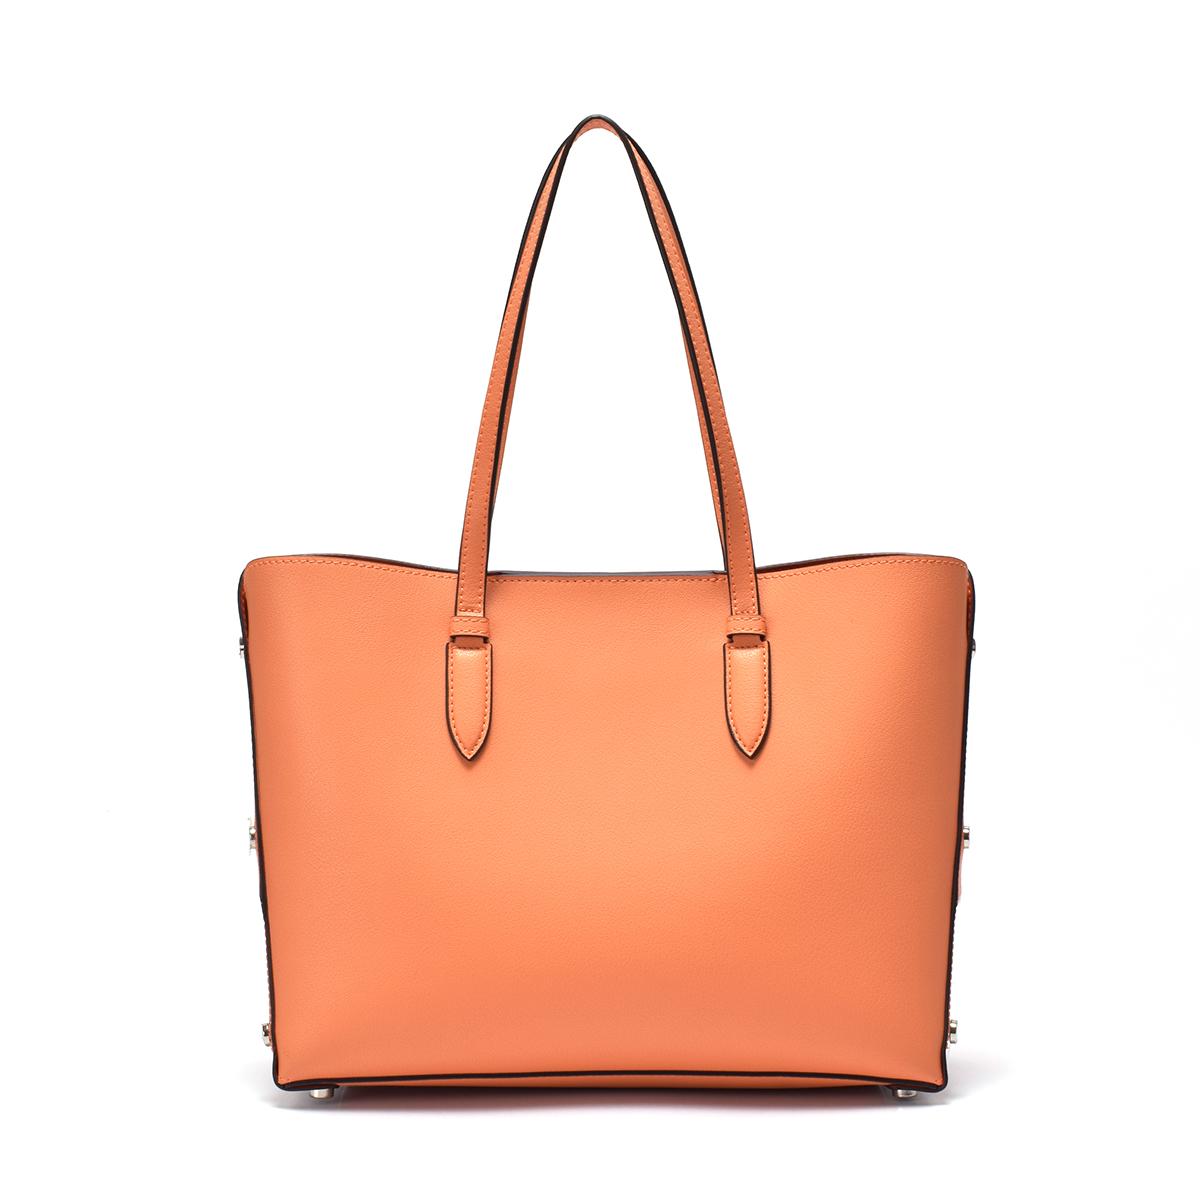 Sanlly oem handbags-2